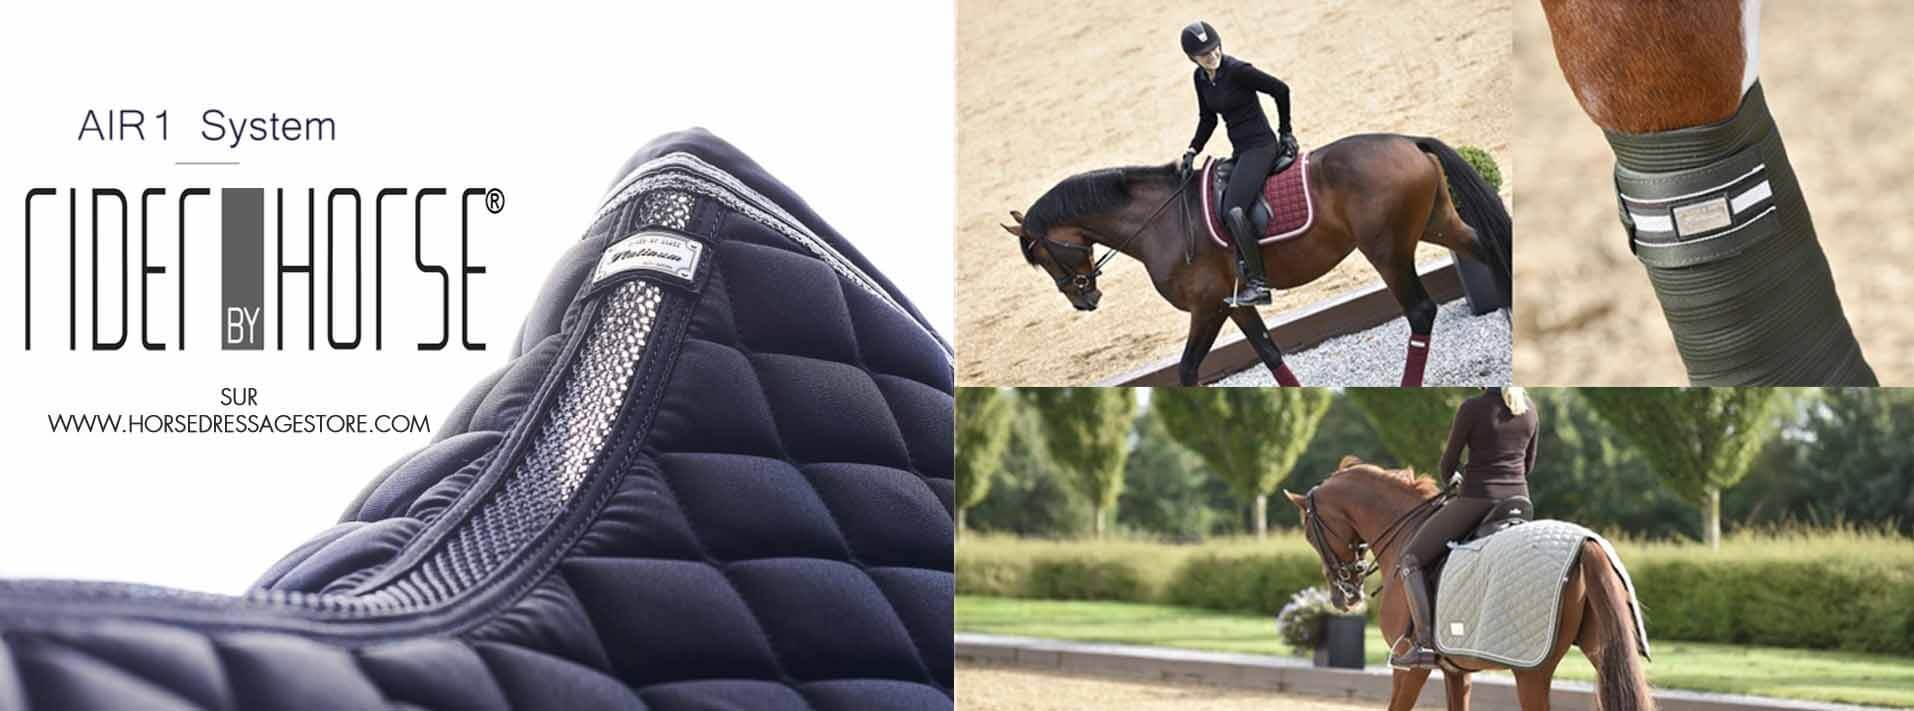 riderbyhorse